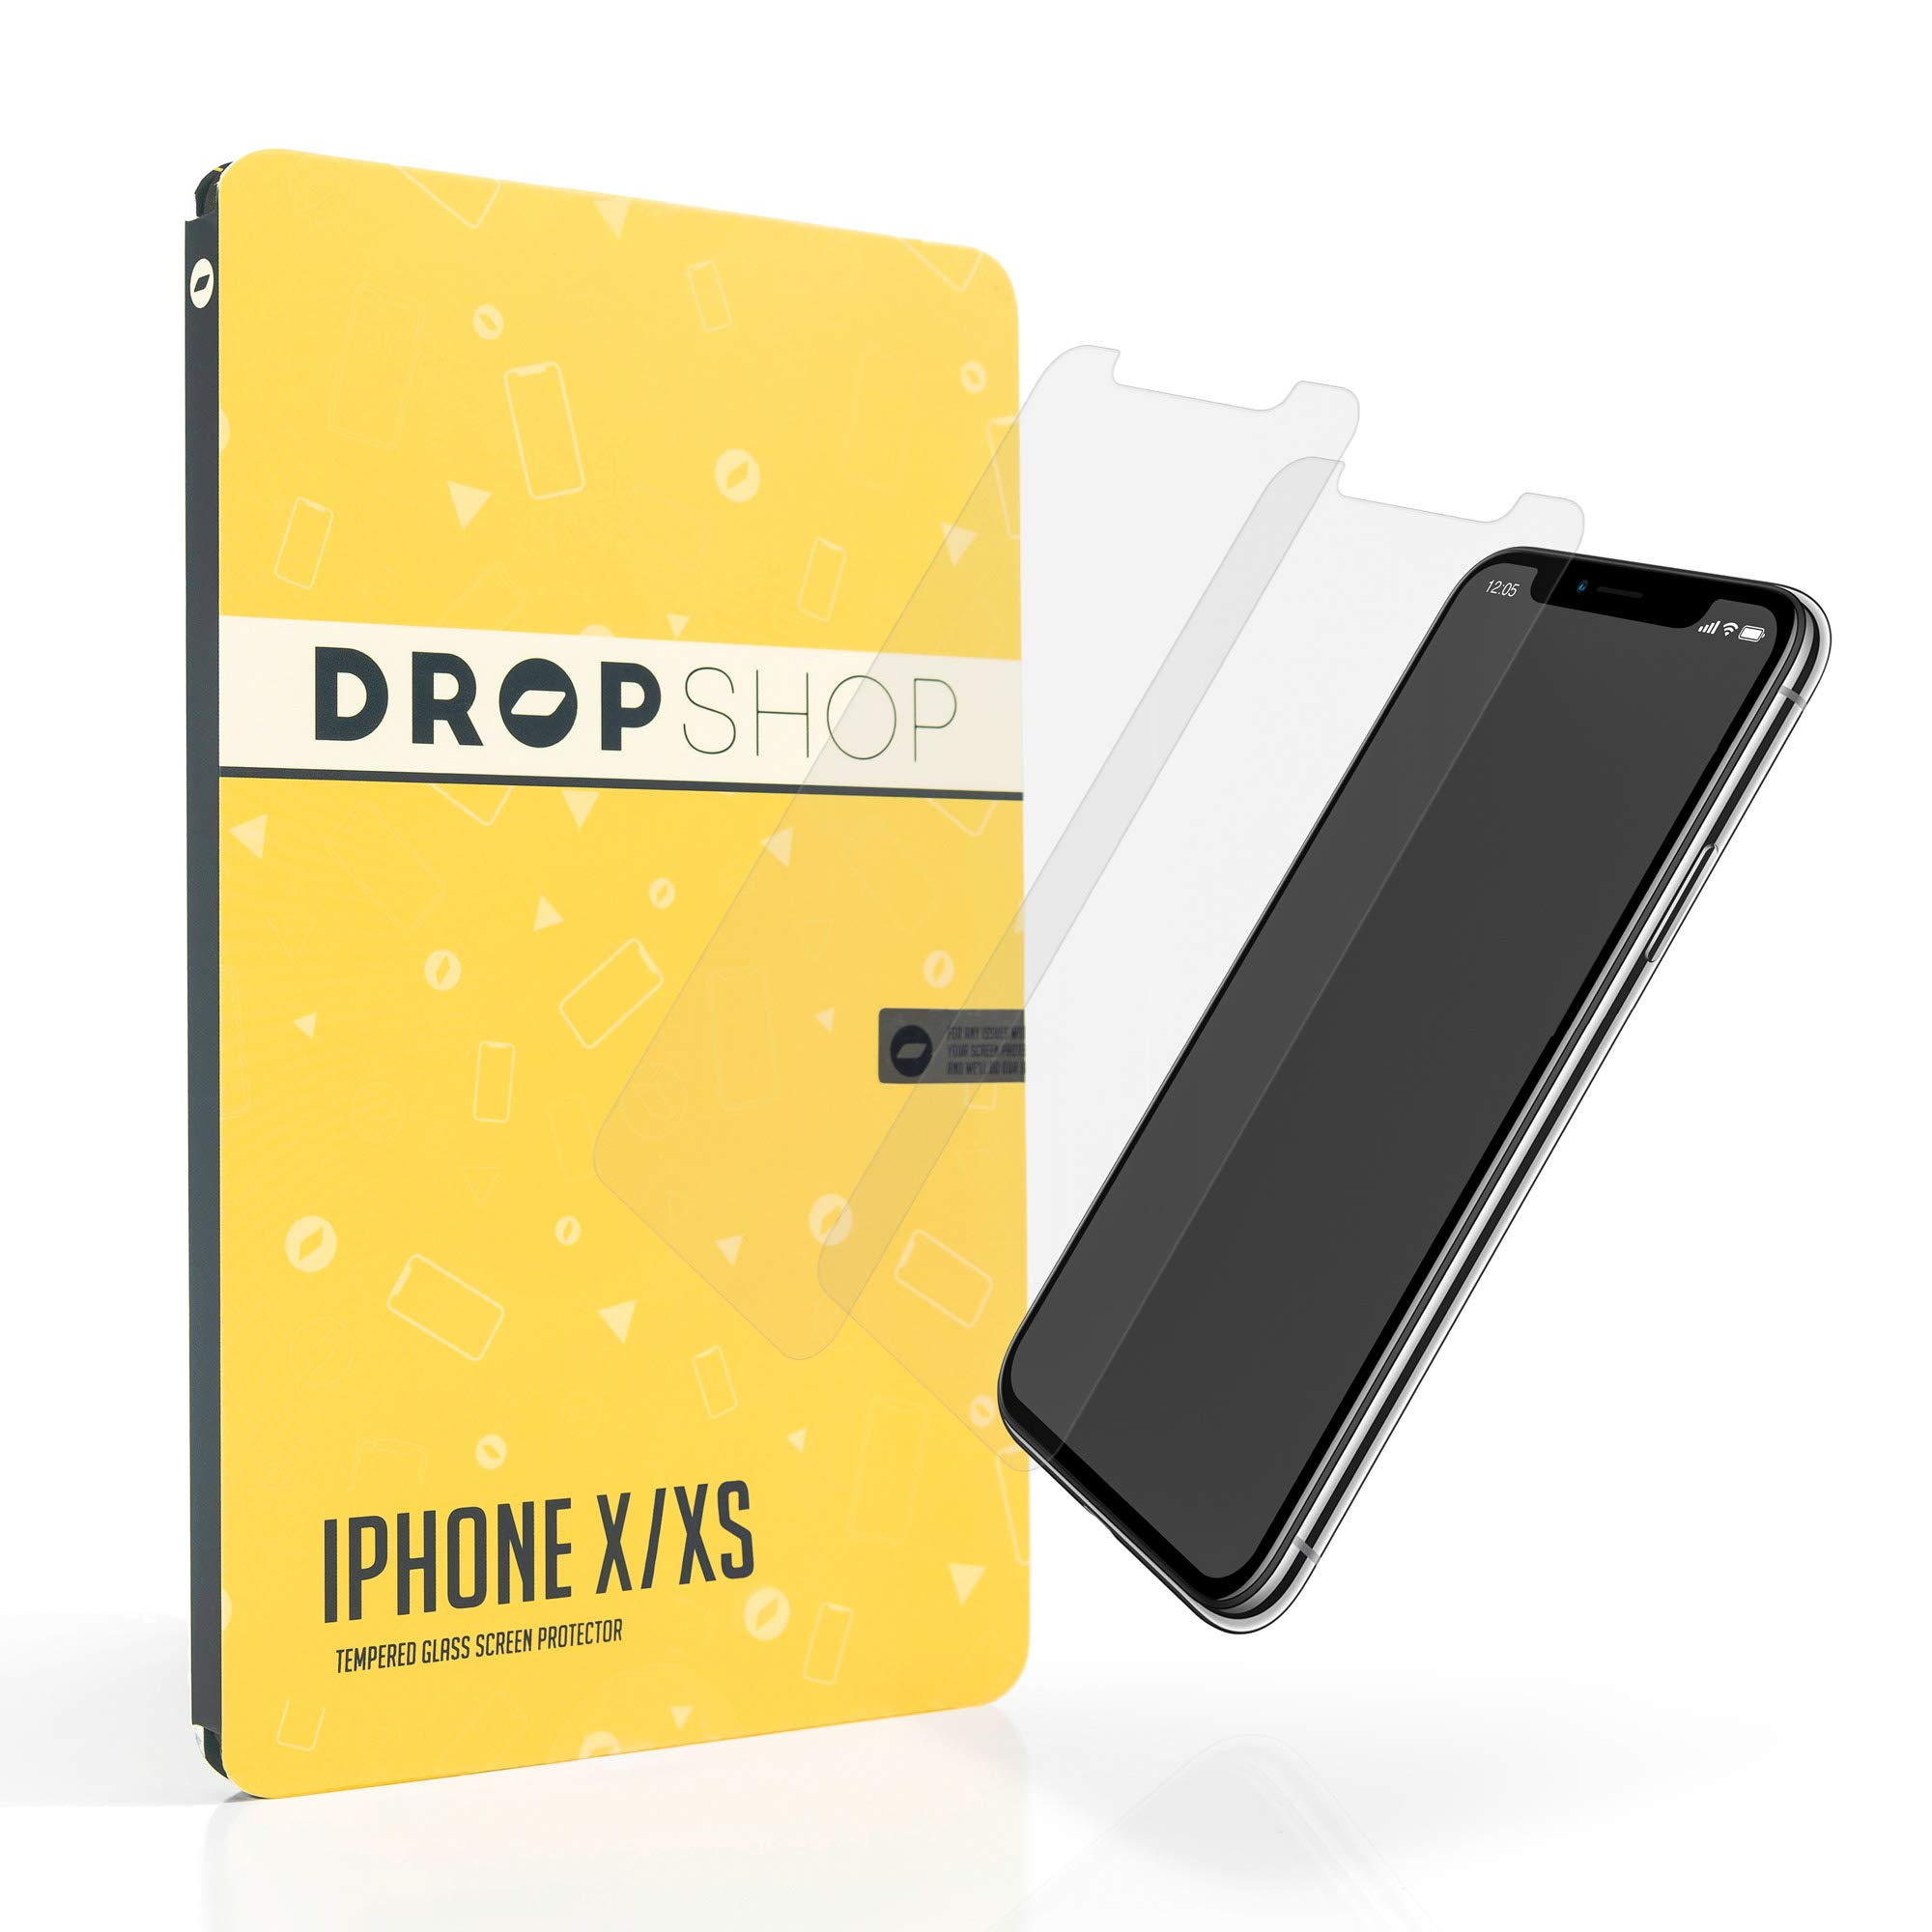 Vidrio Templado Para Iphone x/xs [2 Un.] DROP SHOP